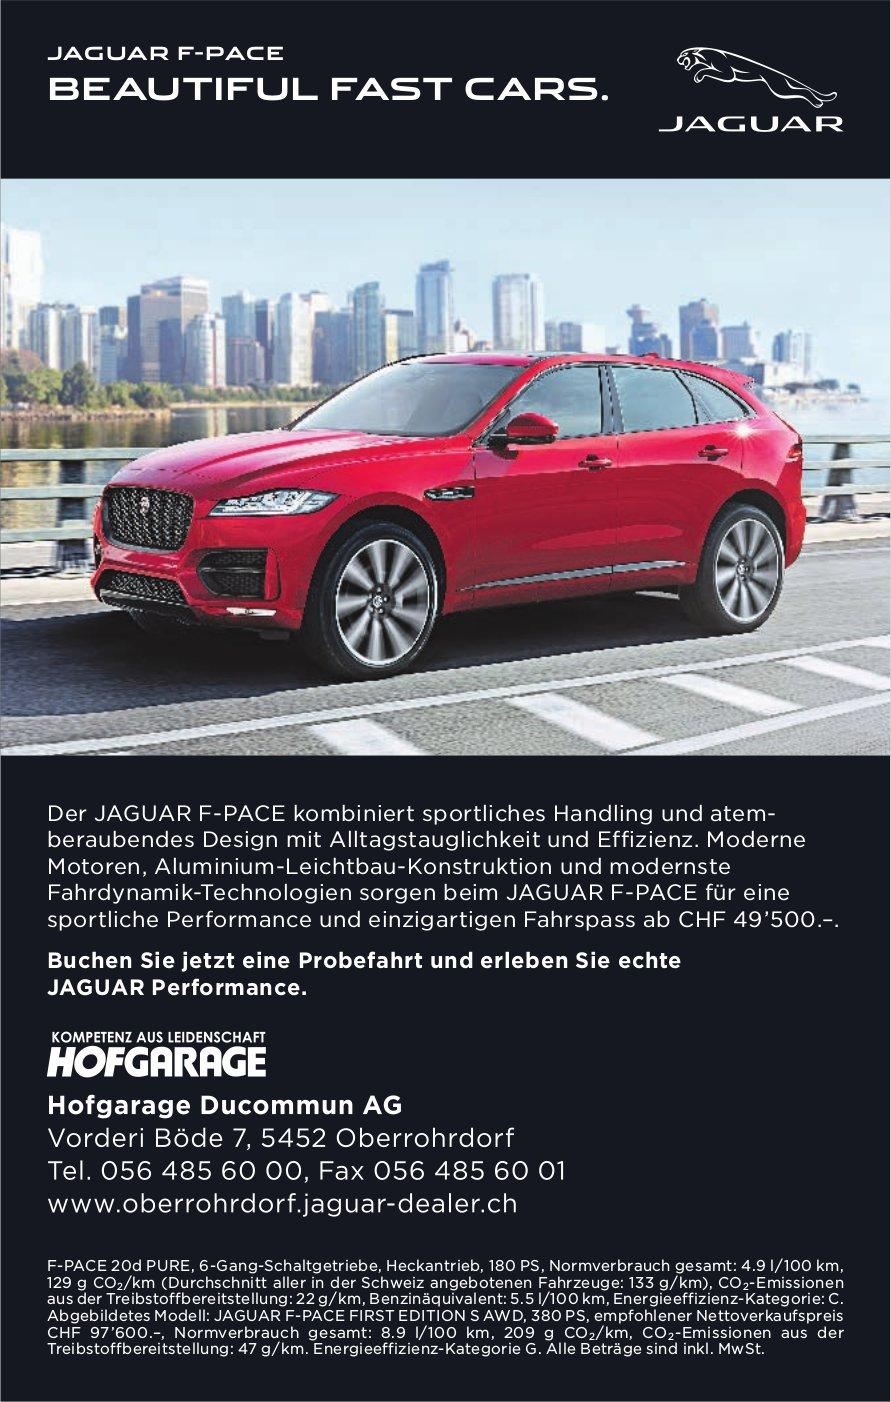 Hofgarage Ducommun AG - JAGUAR F-PACE: BEAUTIFUL FAST CARS.